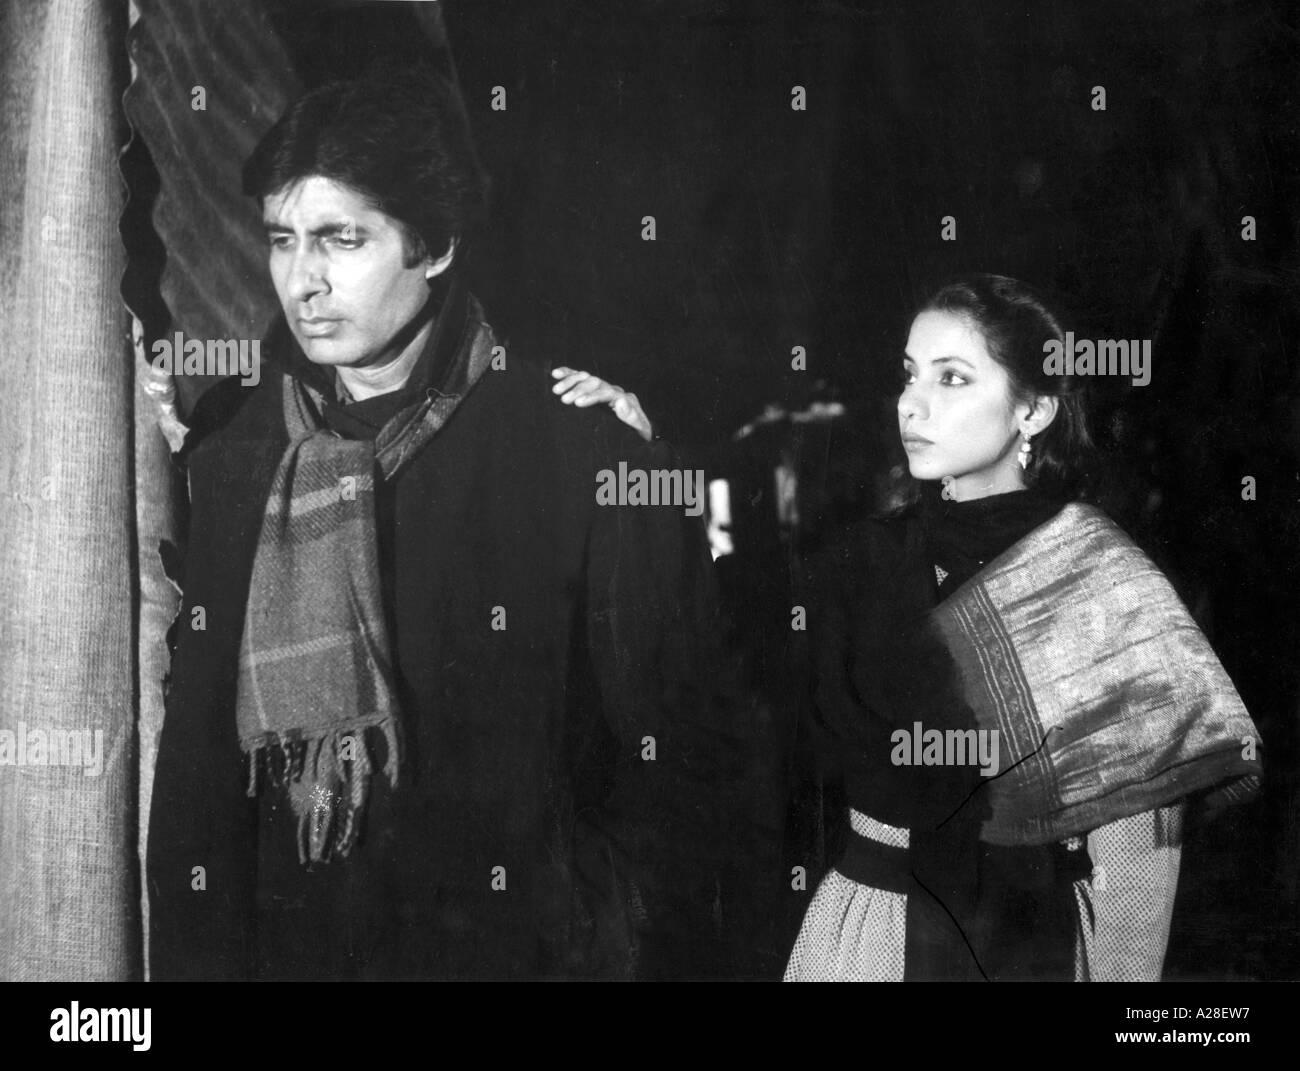 Indian Bollywood Film Star Actor Amitabh Bachchan with Shabana Azmi in Film Meri Aaawaz Suno India - Stock Image